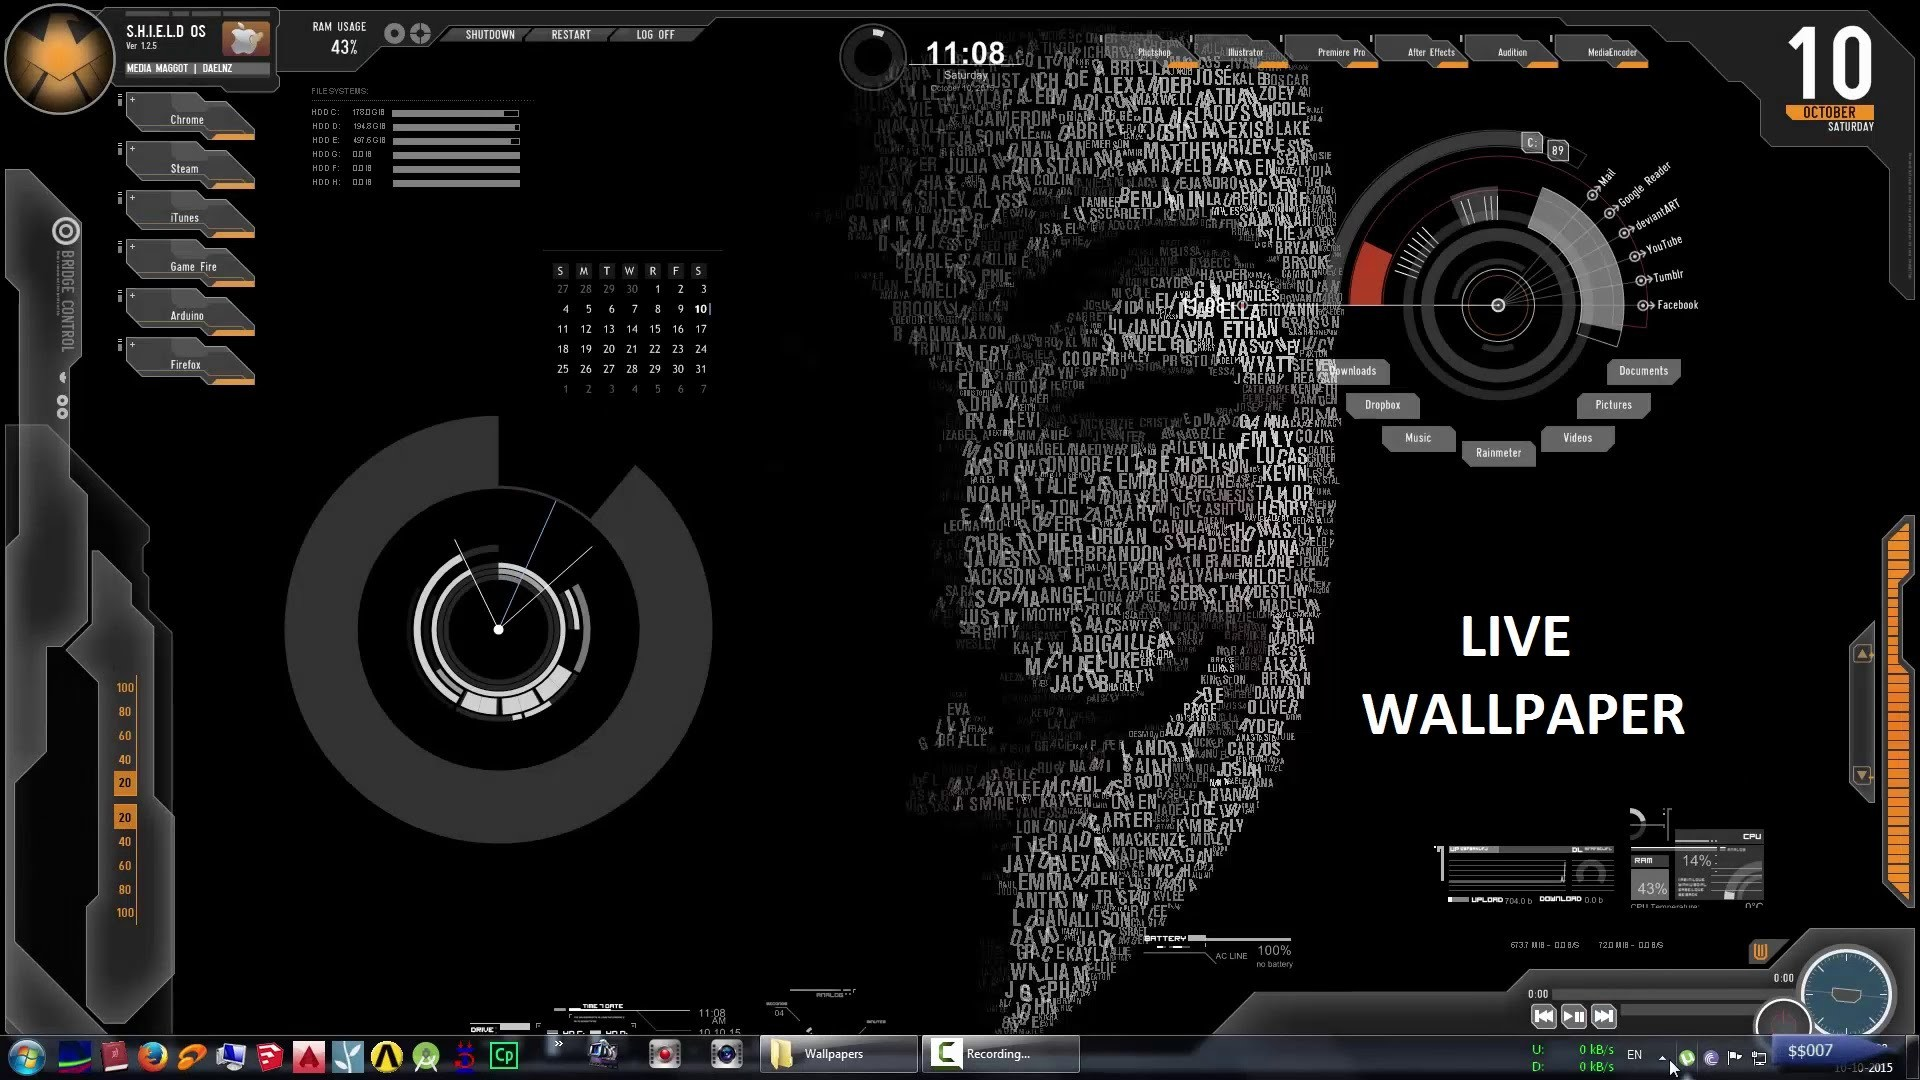 Make your desktop ALIVE with LIVE WALLPAPER – Rainmeter | $$007 – YouTube